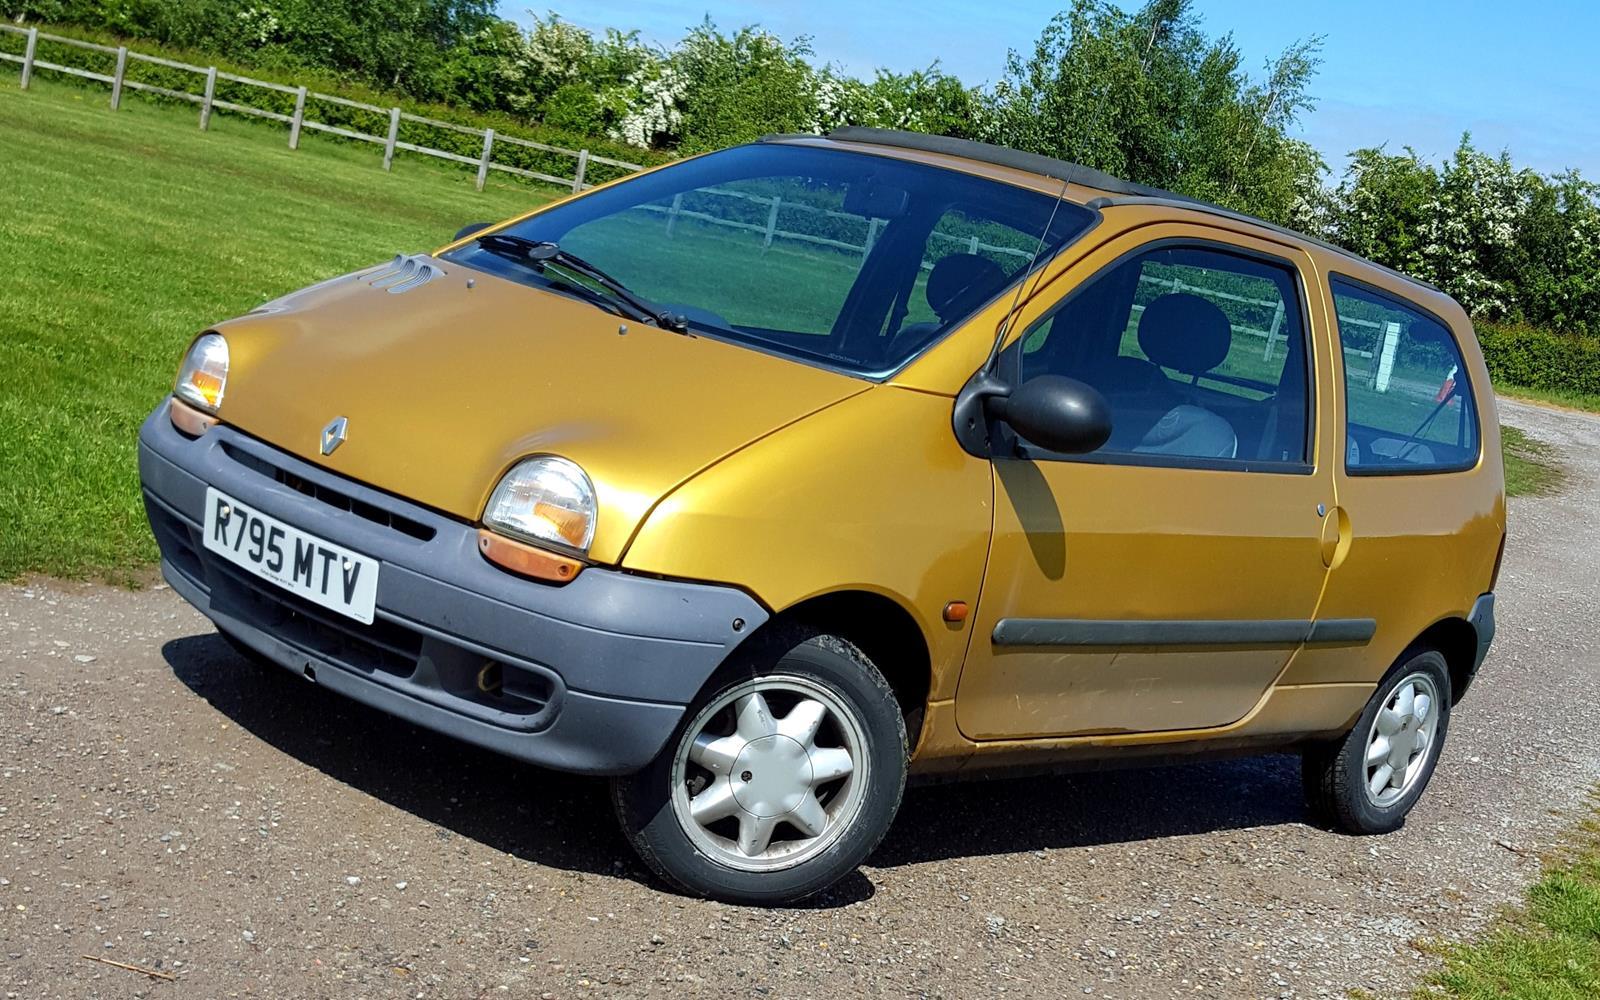 Renault Twingo 1998 Front Left